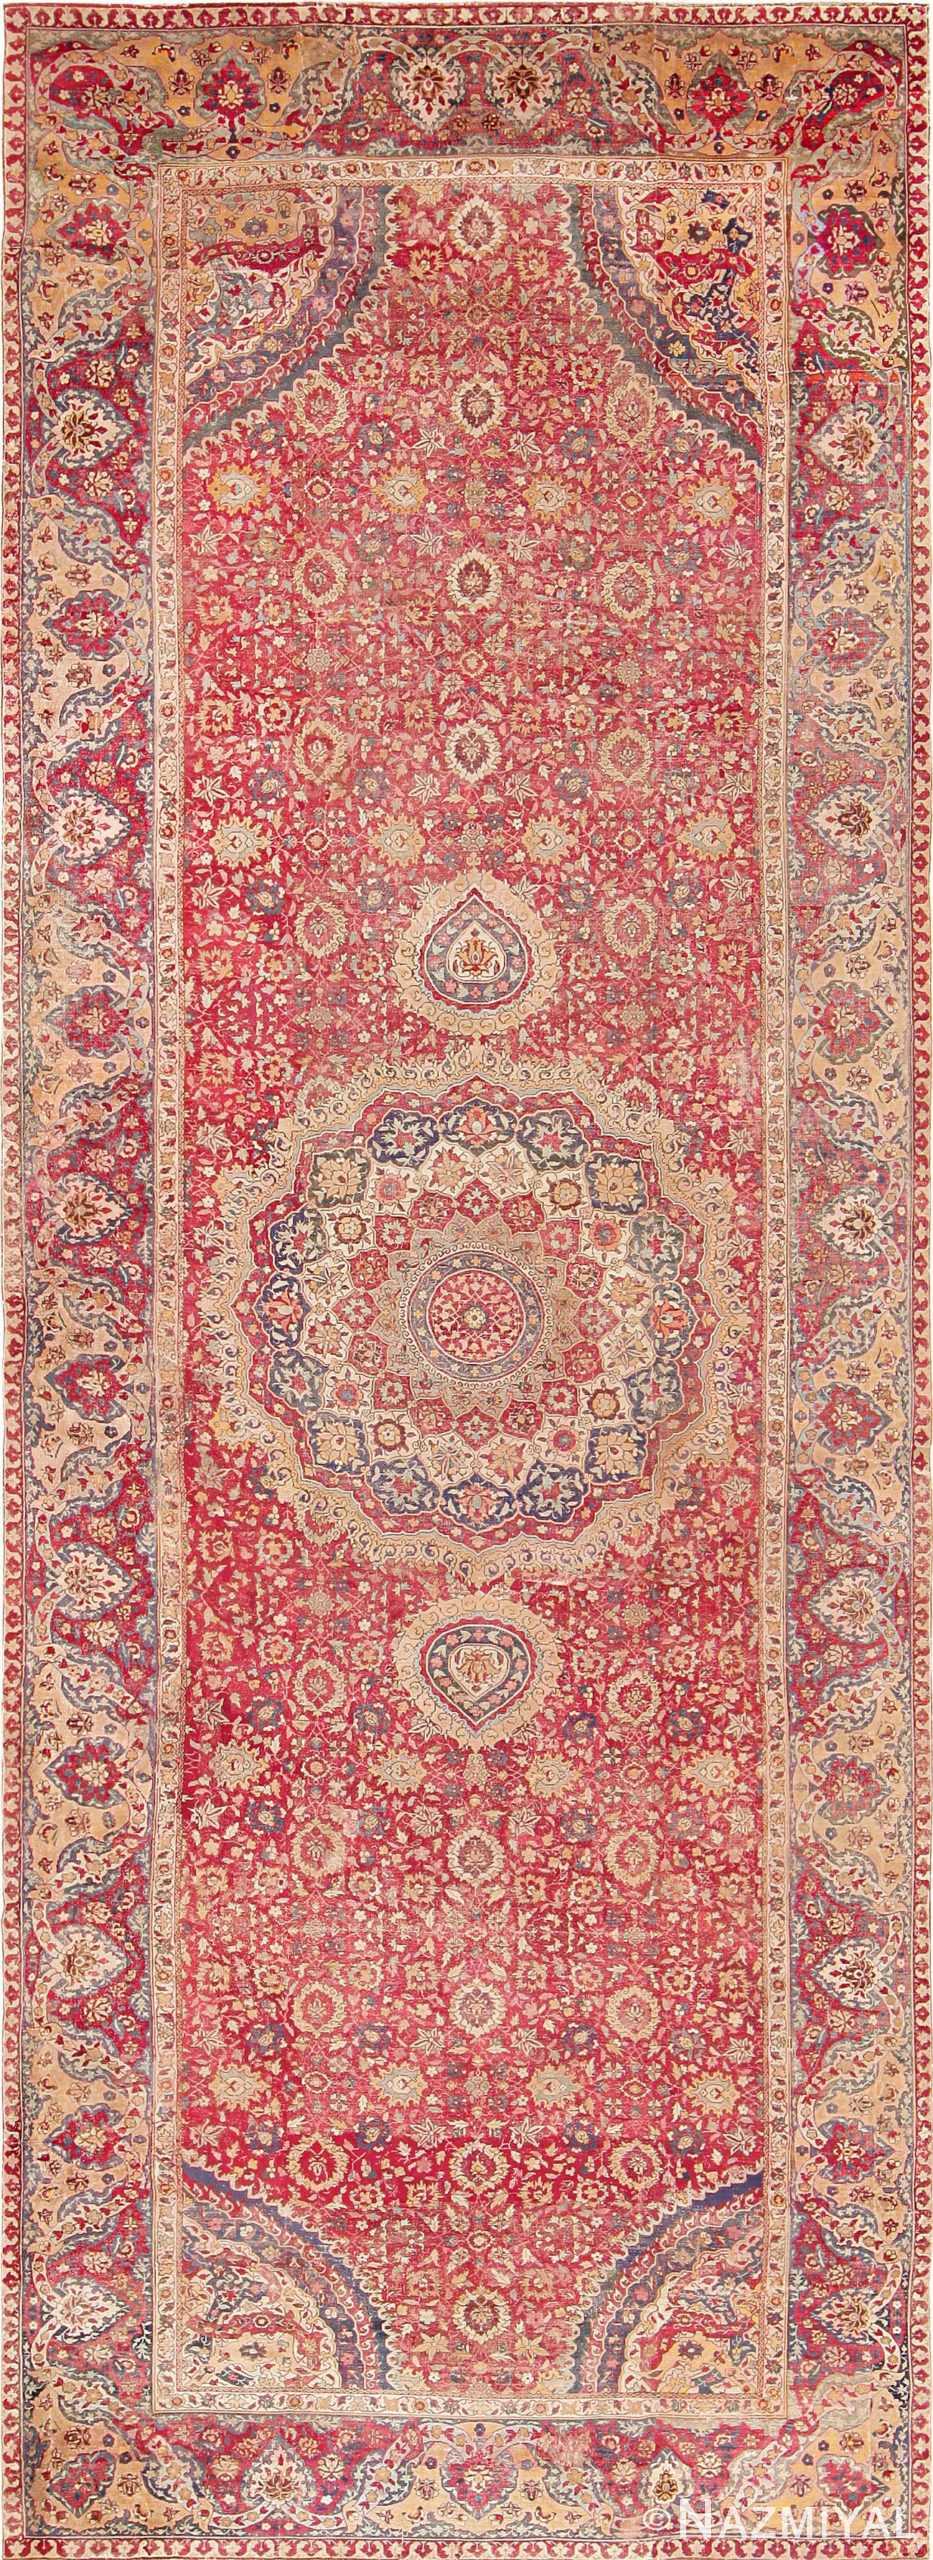 17th Century Mughal Gallery Carpet 47597 Nazmiyal